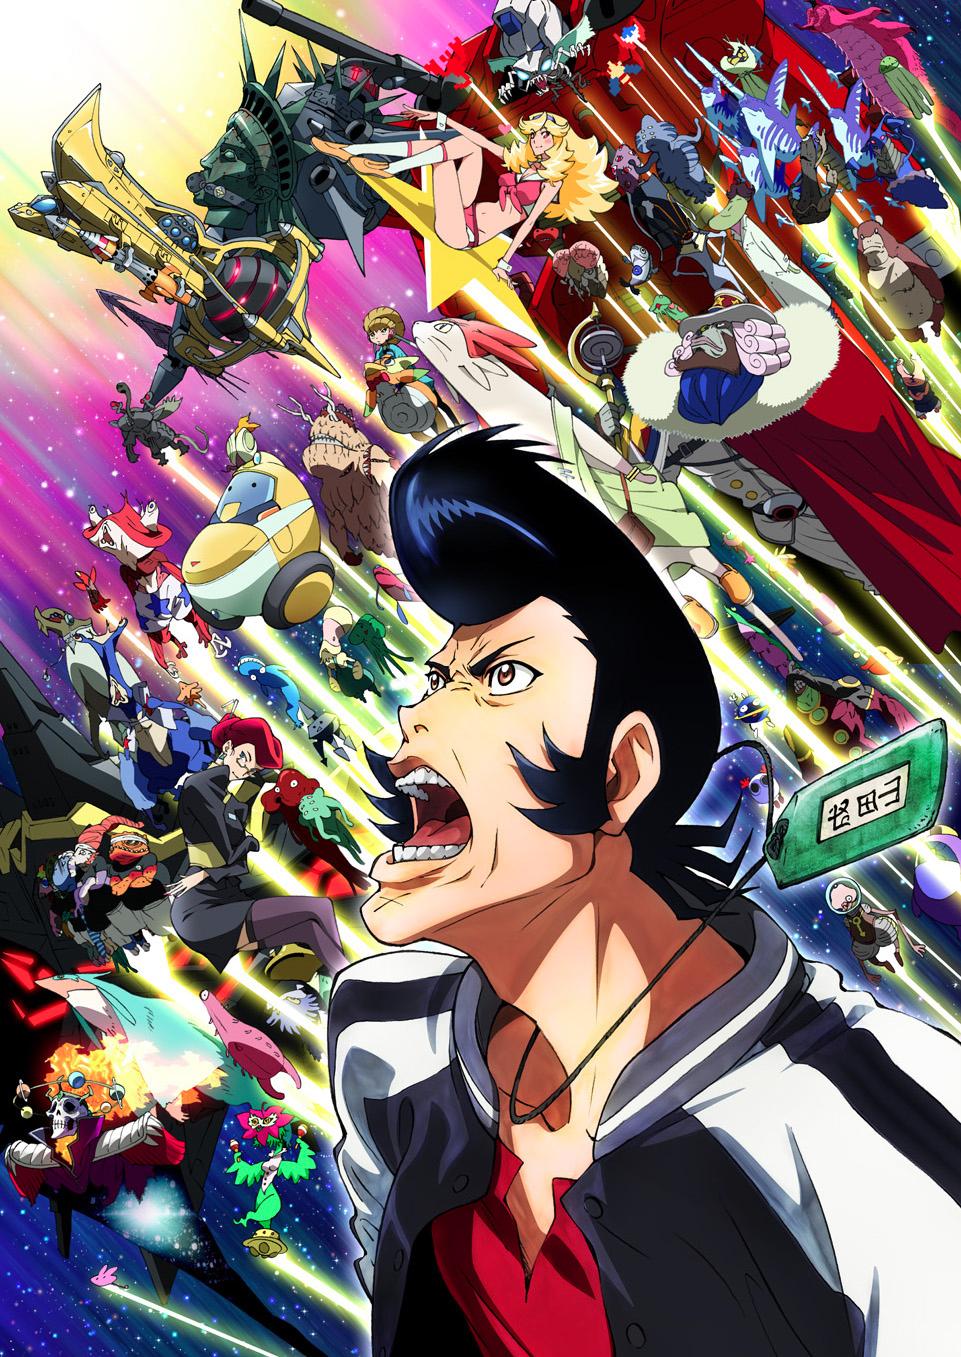 japanese-animator-trashes-english-dub-of-space-dandy-on-twitter.jpg